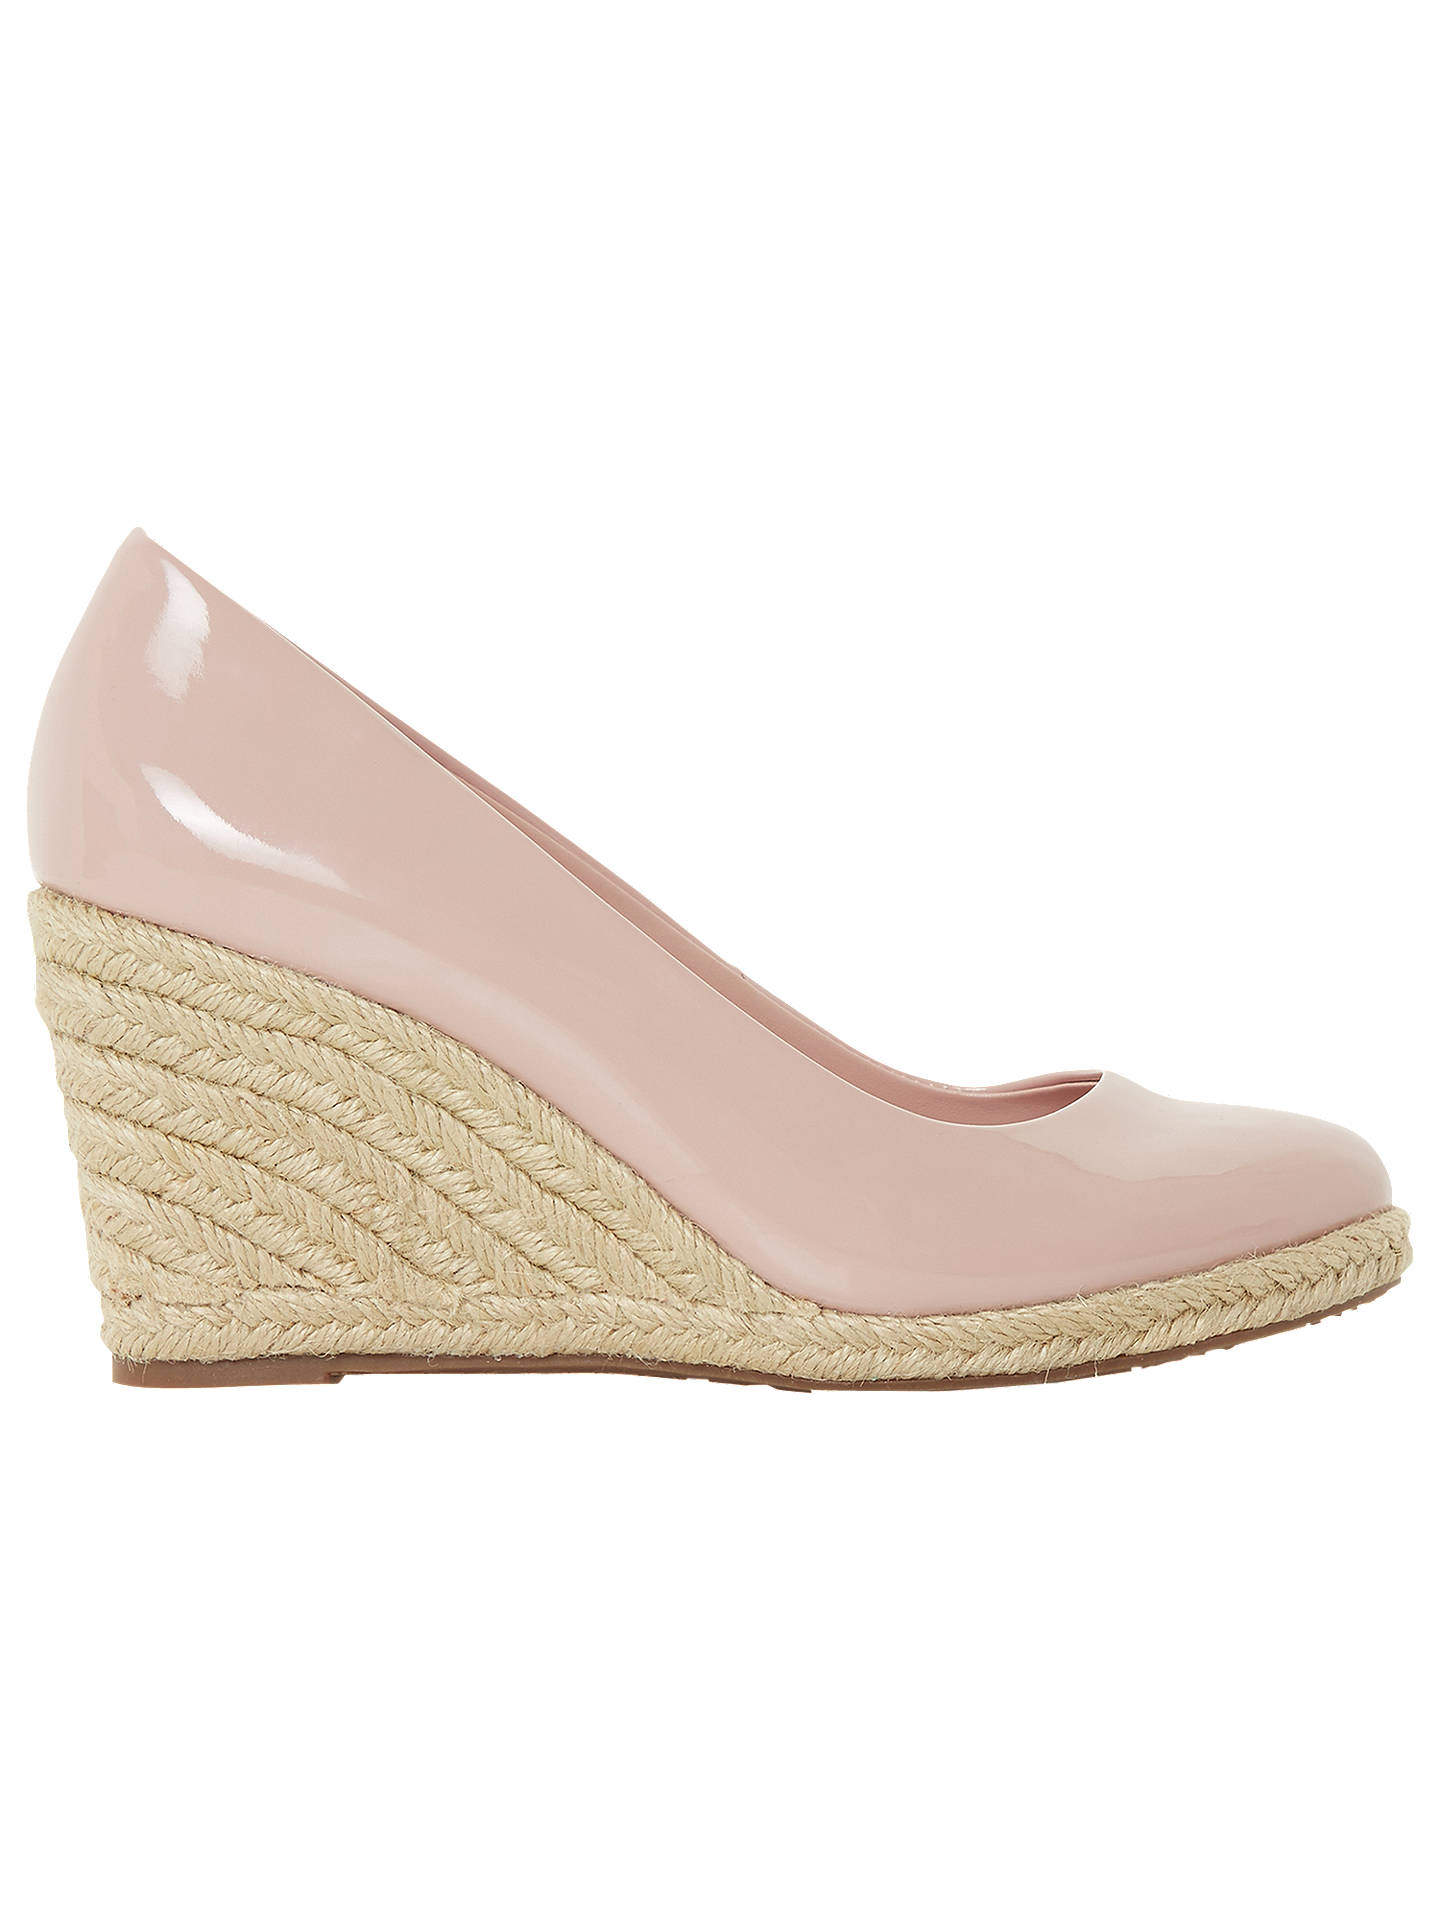 cc3f8b5778f Dune Annabela High Wedge Heel Court Shoes at John Lewis   Partners